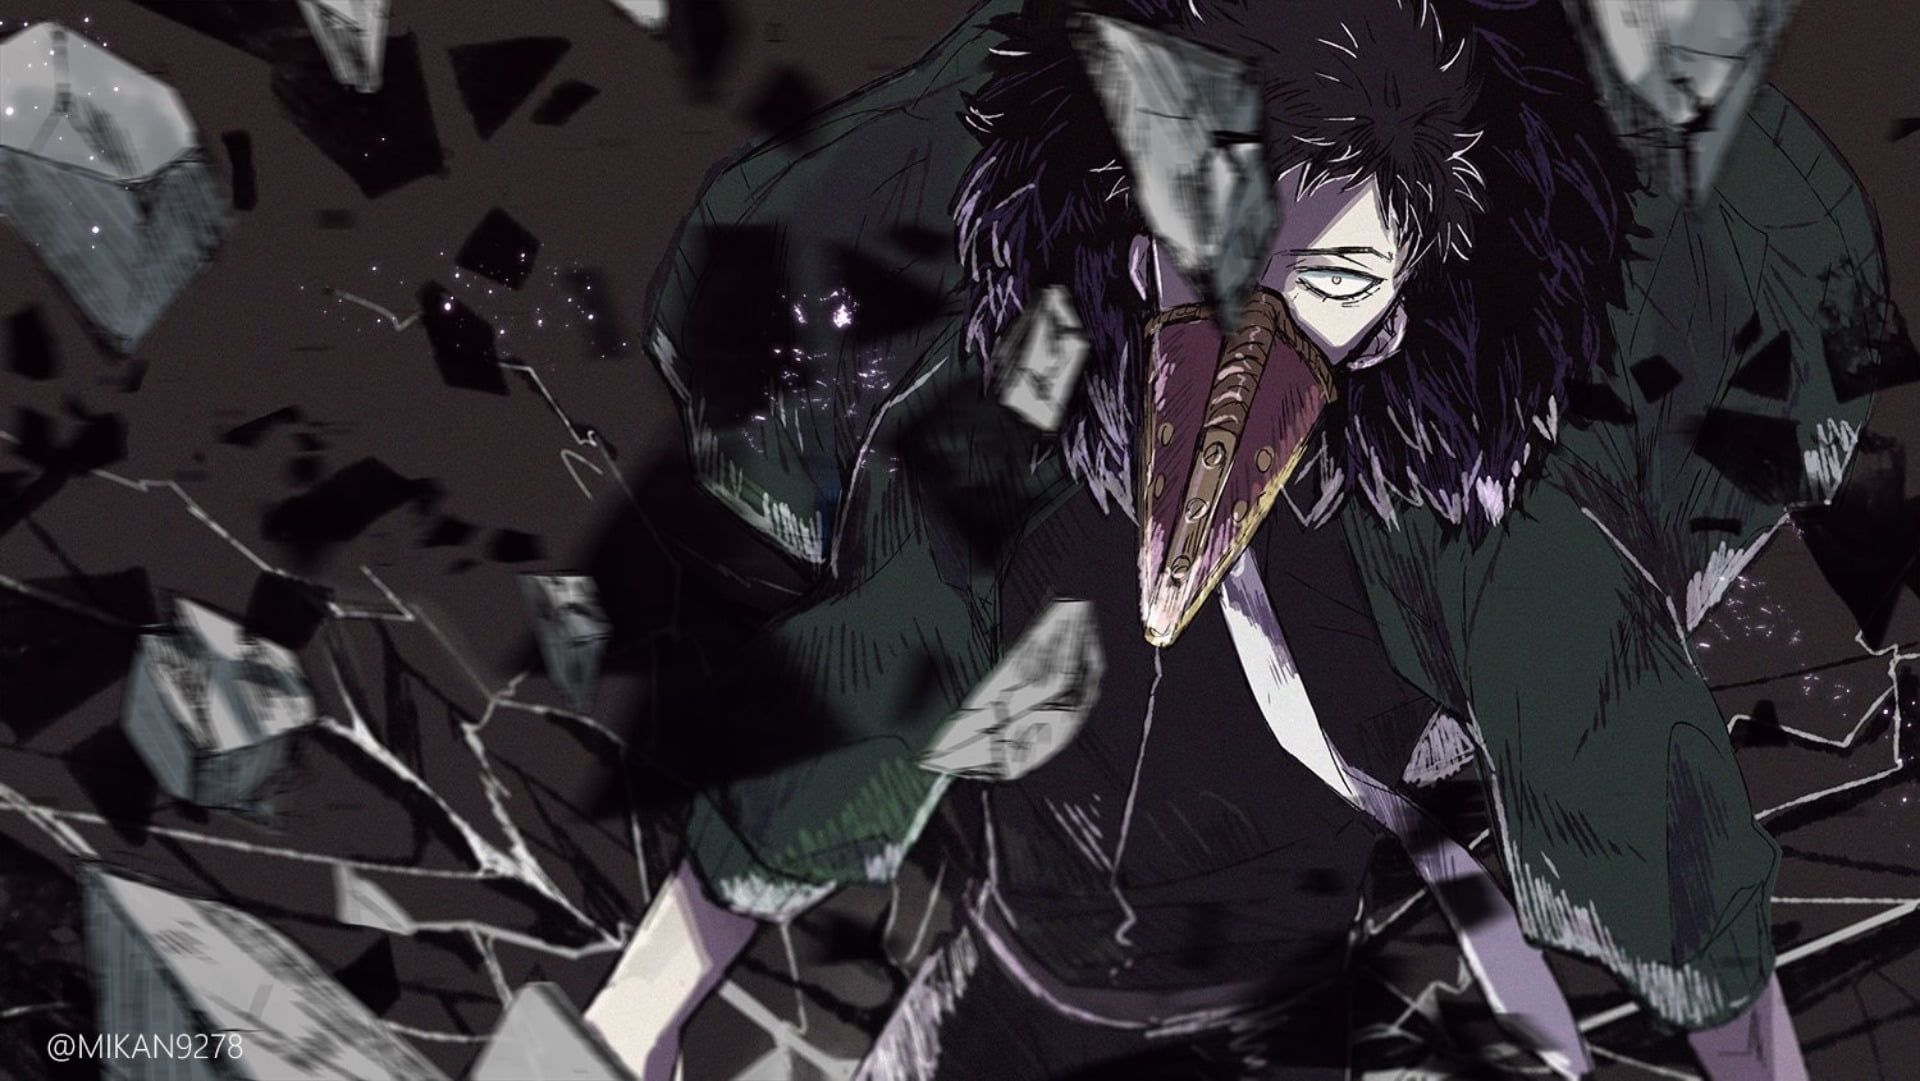 Anime My Hero Academia Kai Chisaki Overhaul My Hero Academia 1080p Wallpaper Hdwallpaper Desktop My Hero My Hero Academia Hero